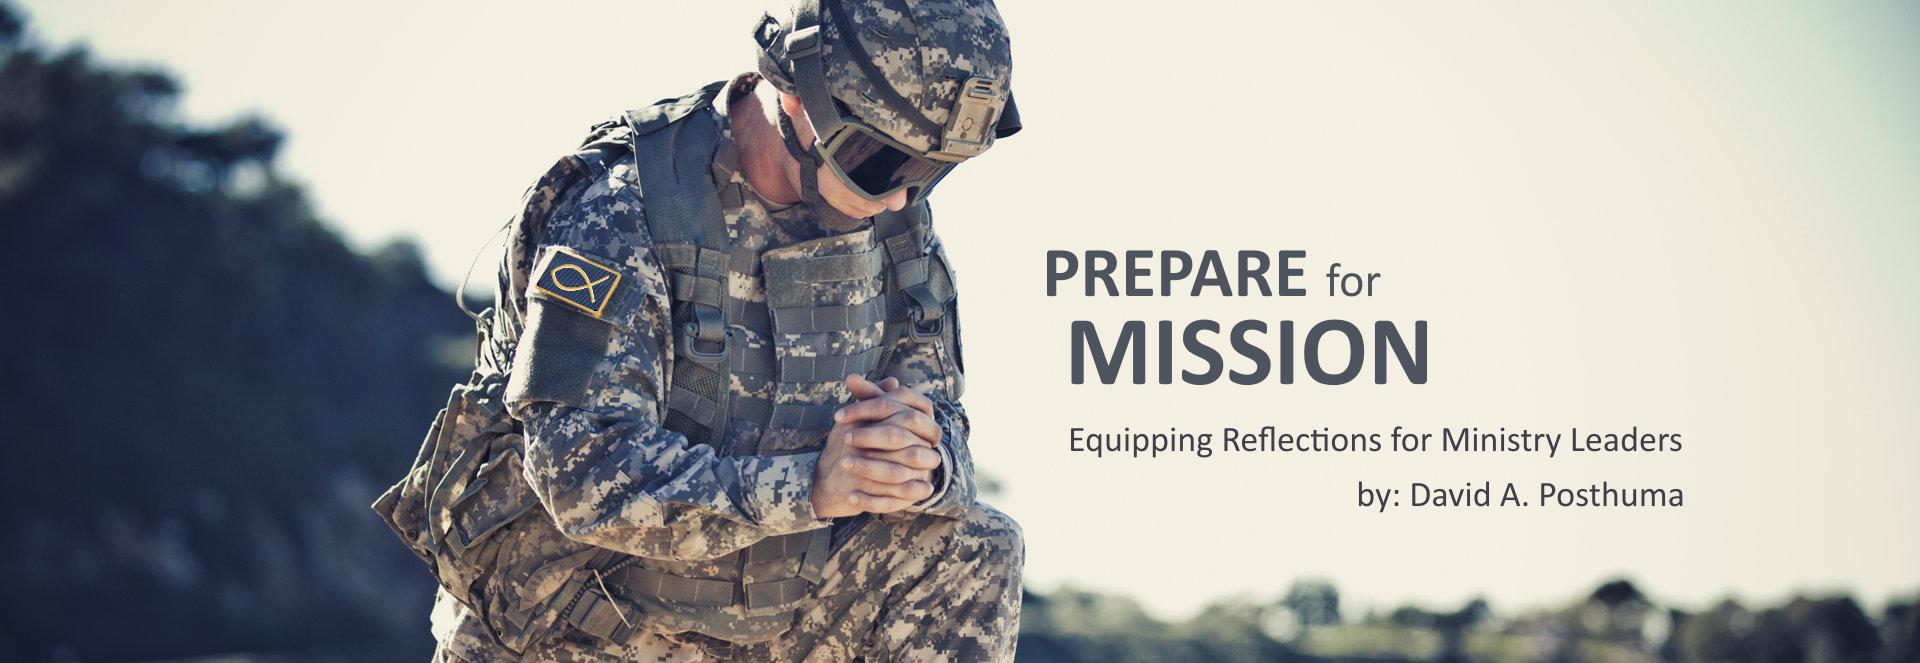 Prepare for Mission by David A Posthuma